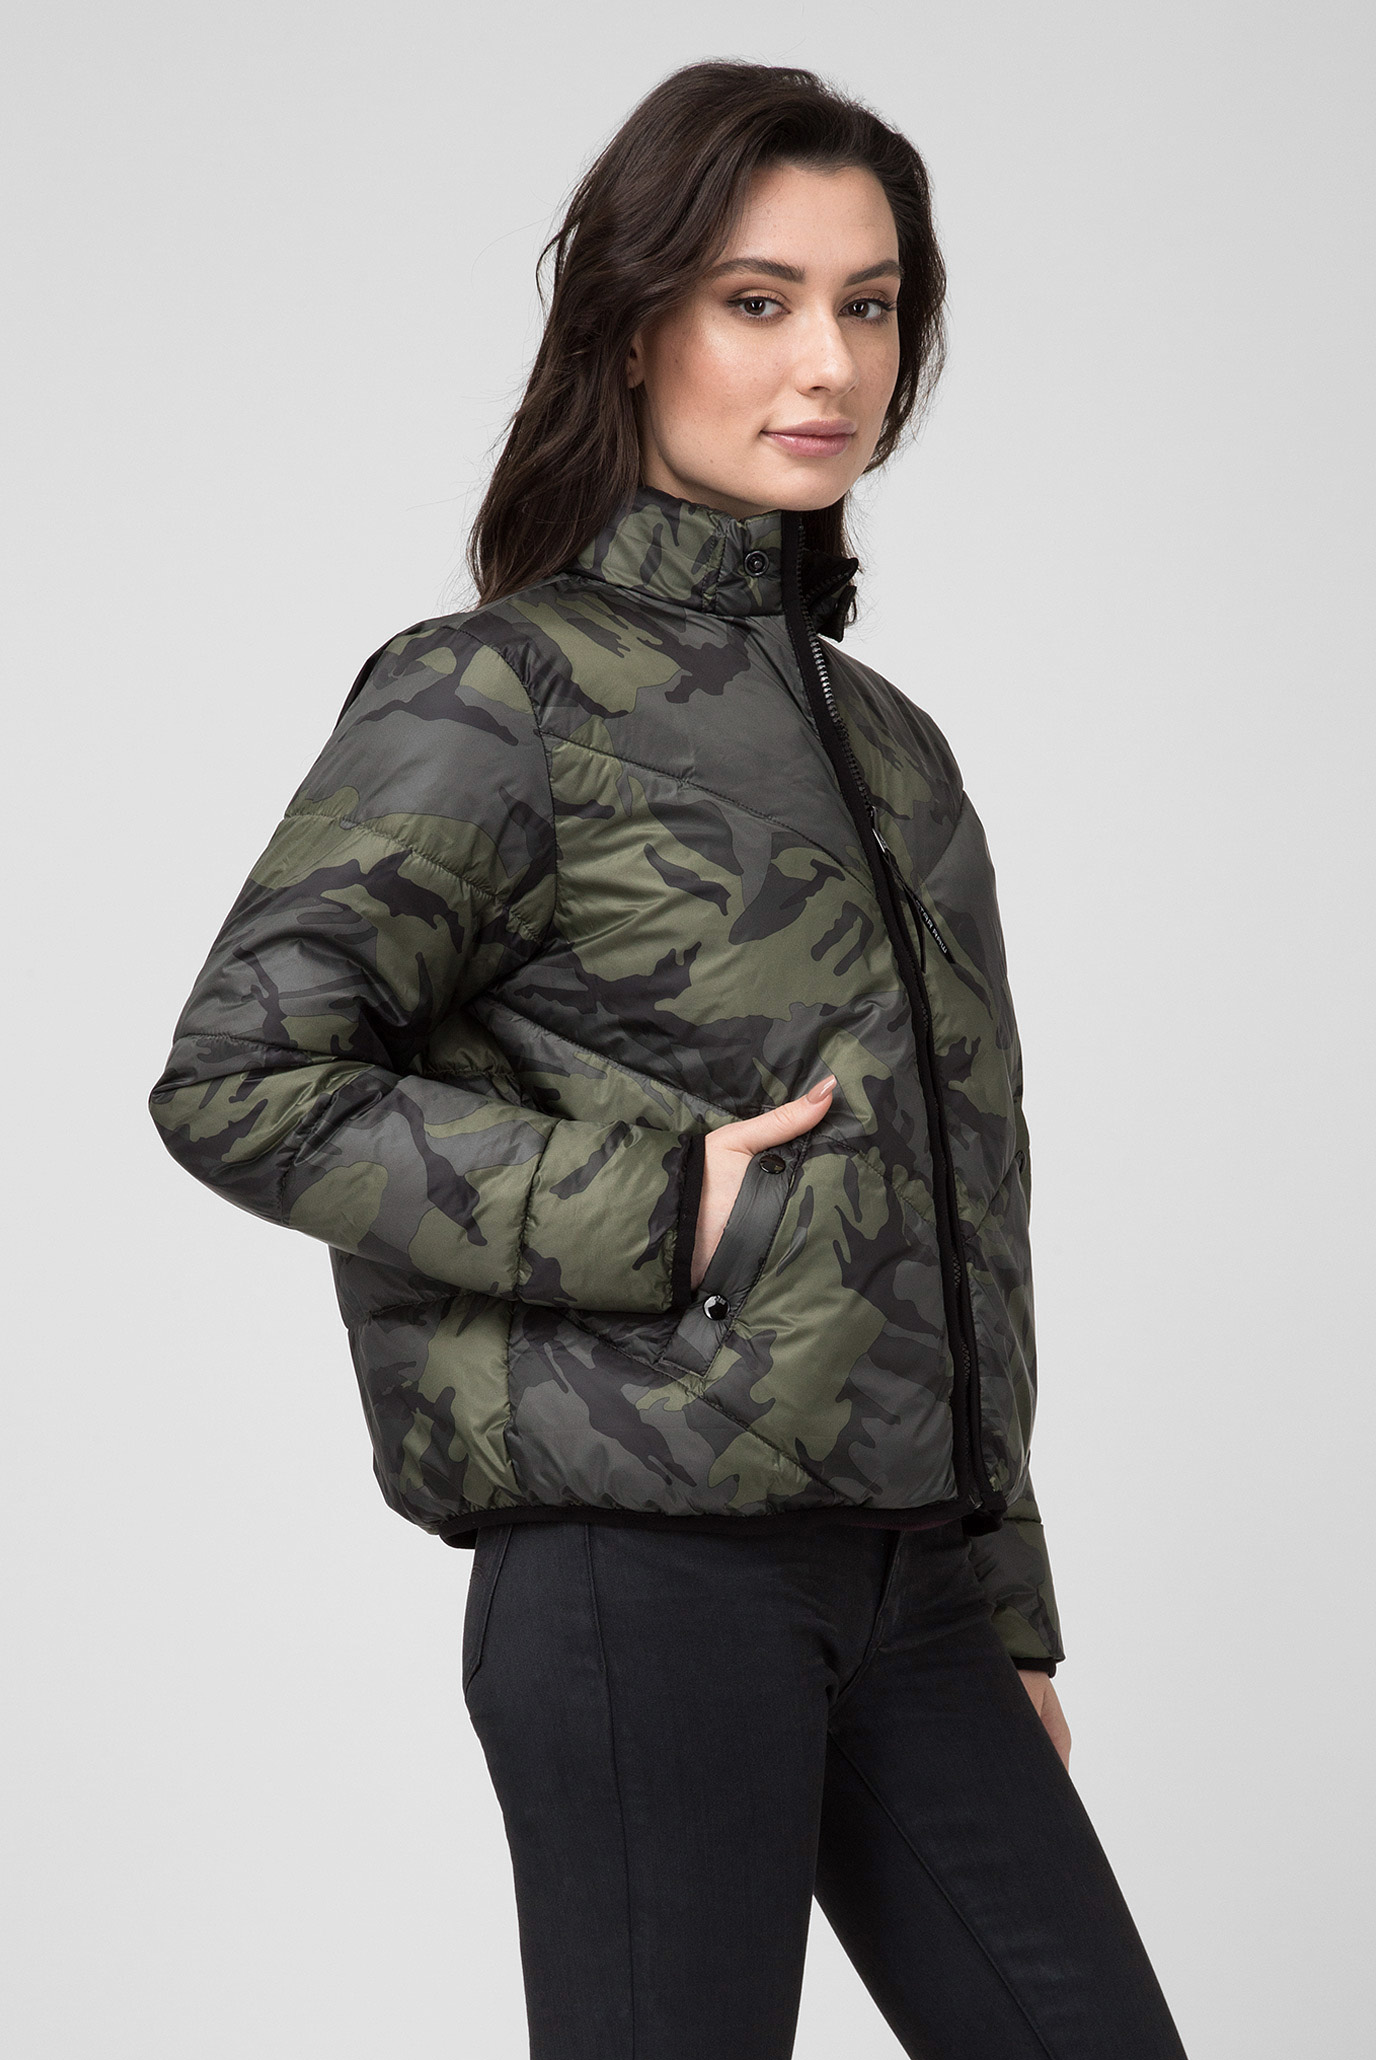 Купить Женская двусторонняя куртка Whistler  G-Star RAW G-Star RAW D10353,A751 – Киев, Украина. Цены в интернет магазине MD Fashion